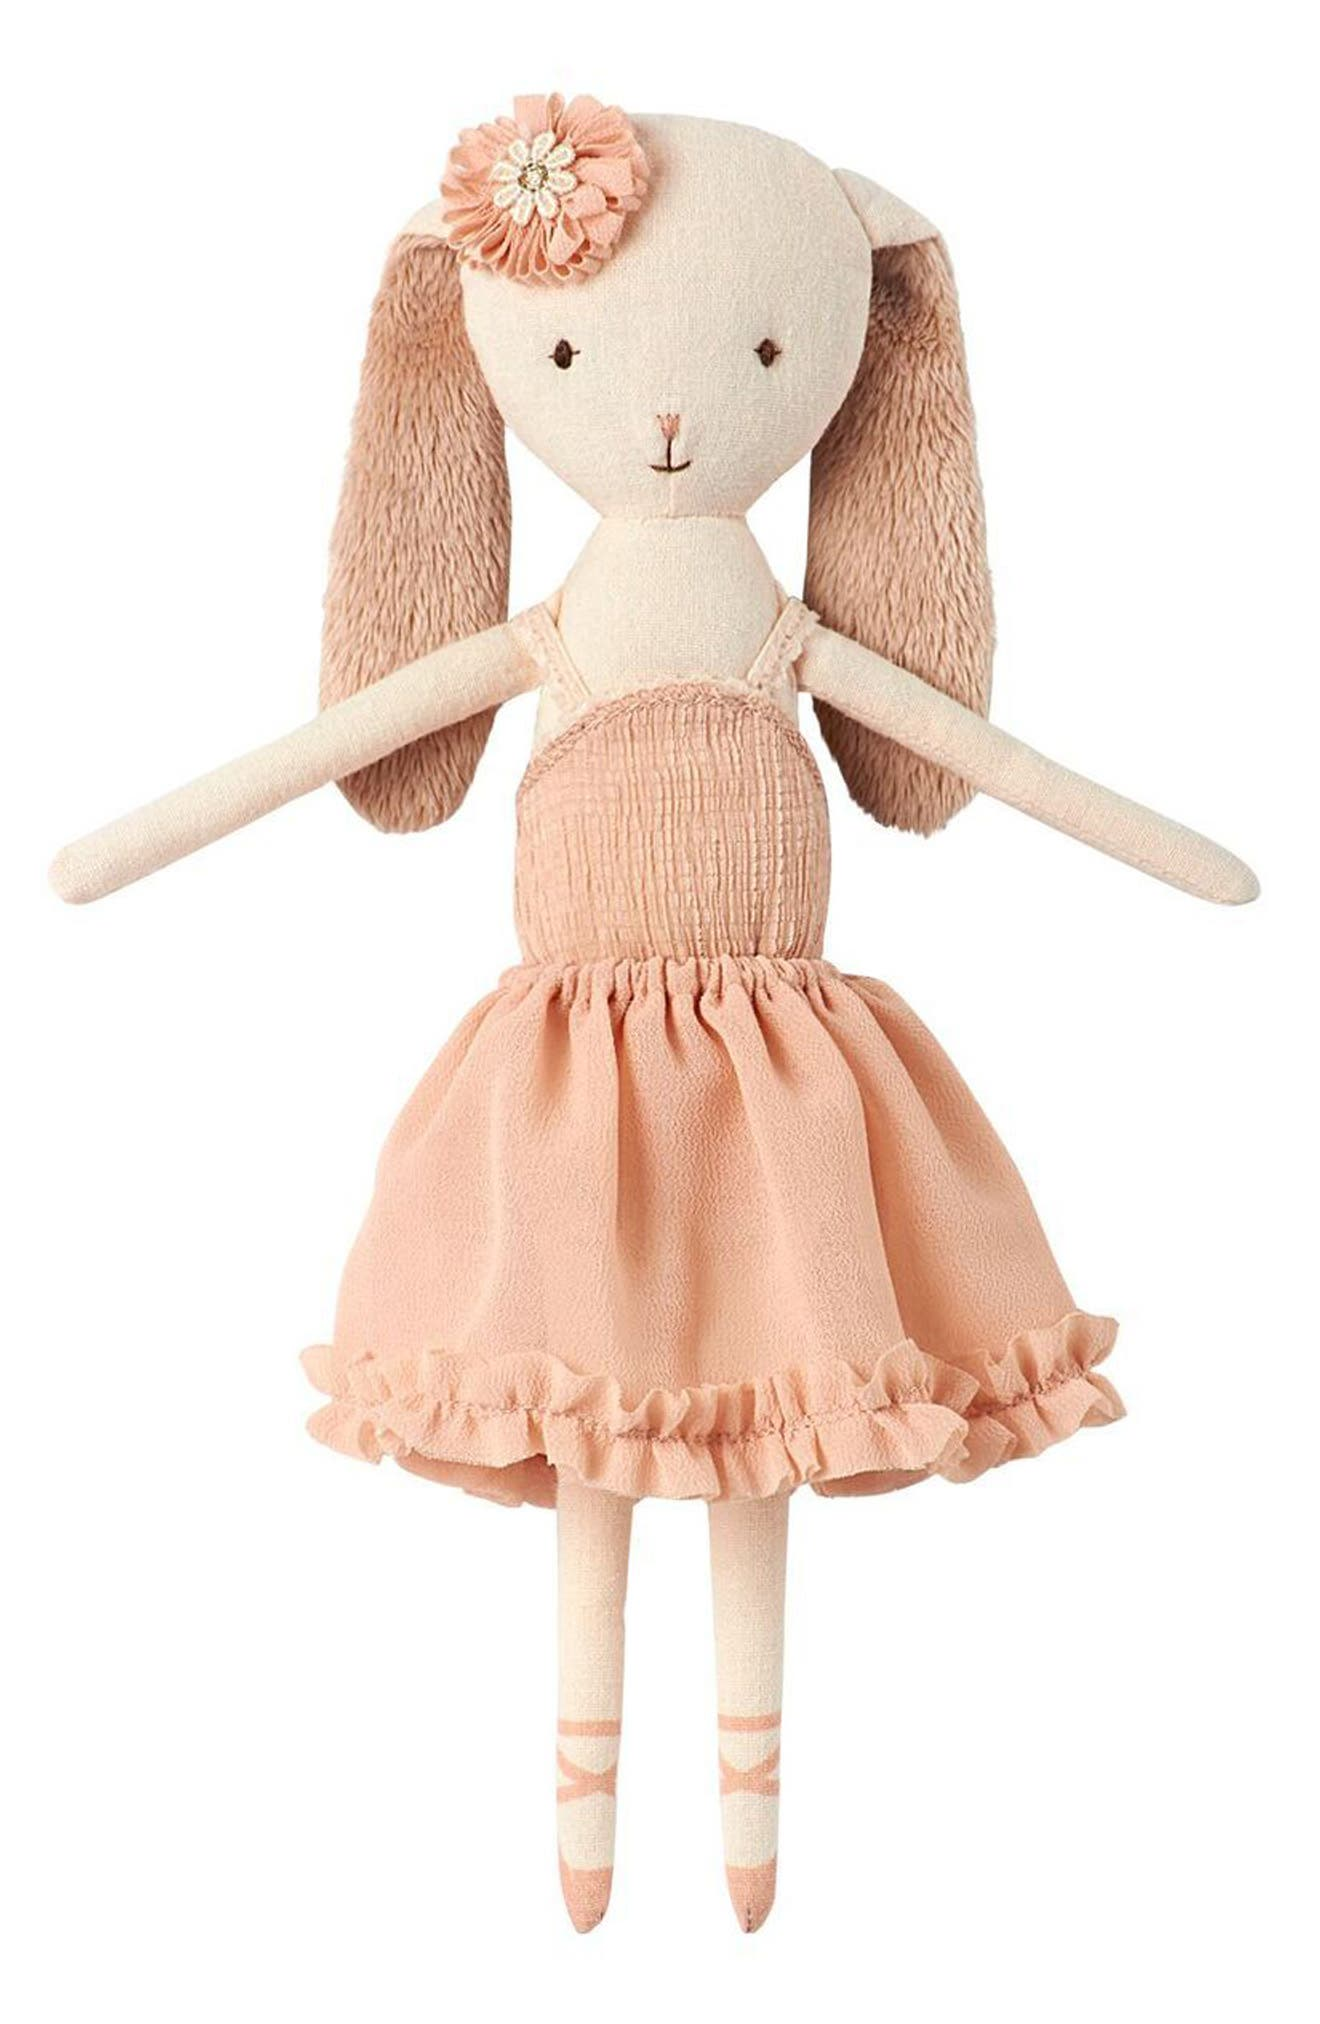 Main Image - Maileg Dancing Bunny Stuffed Animal